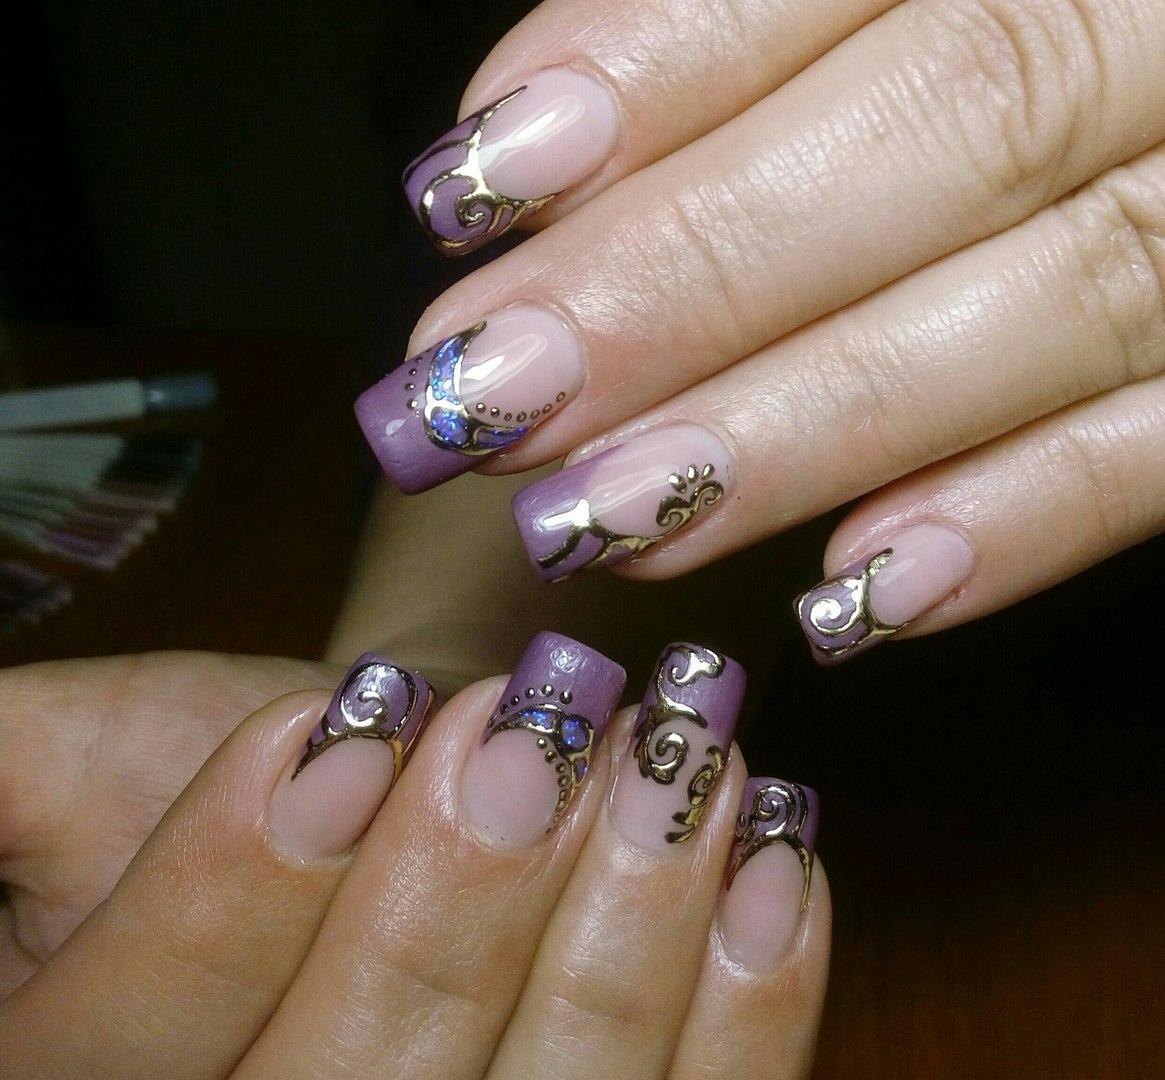 Красивое литье на ногтях с френчем